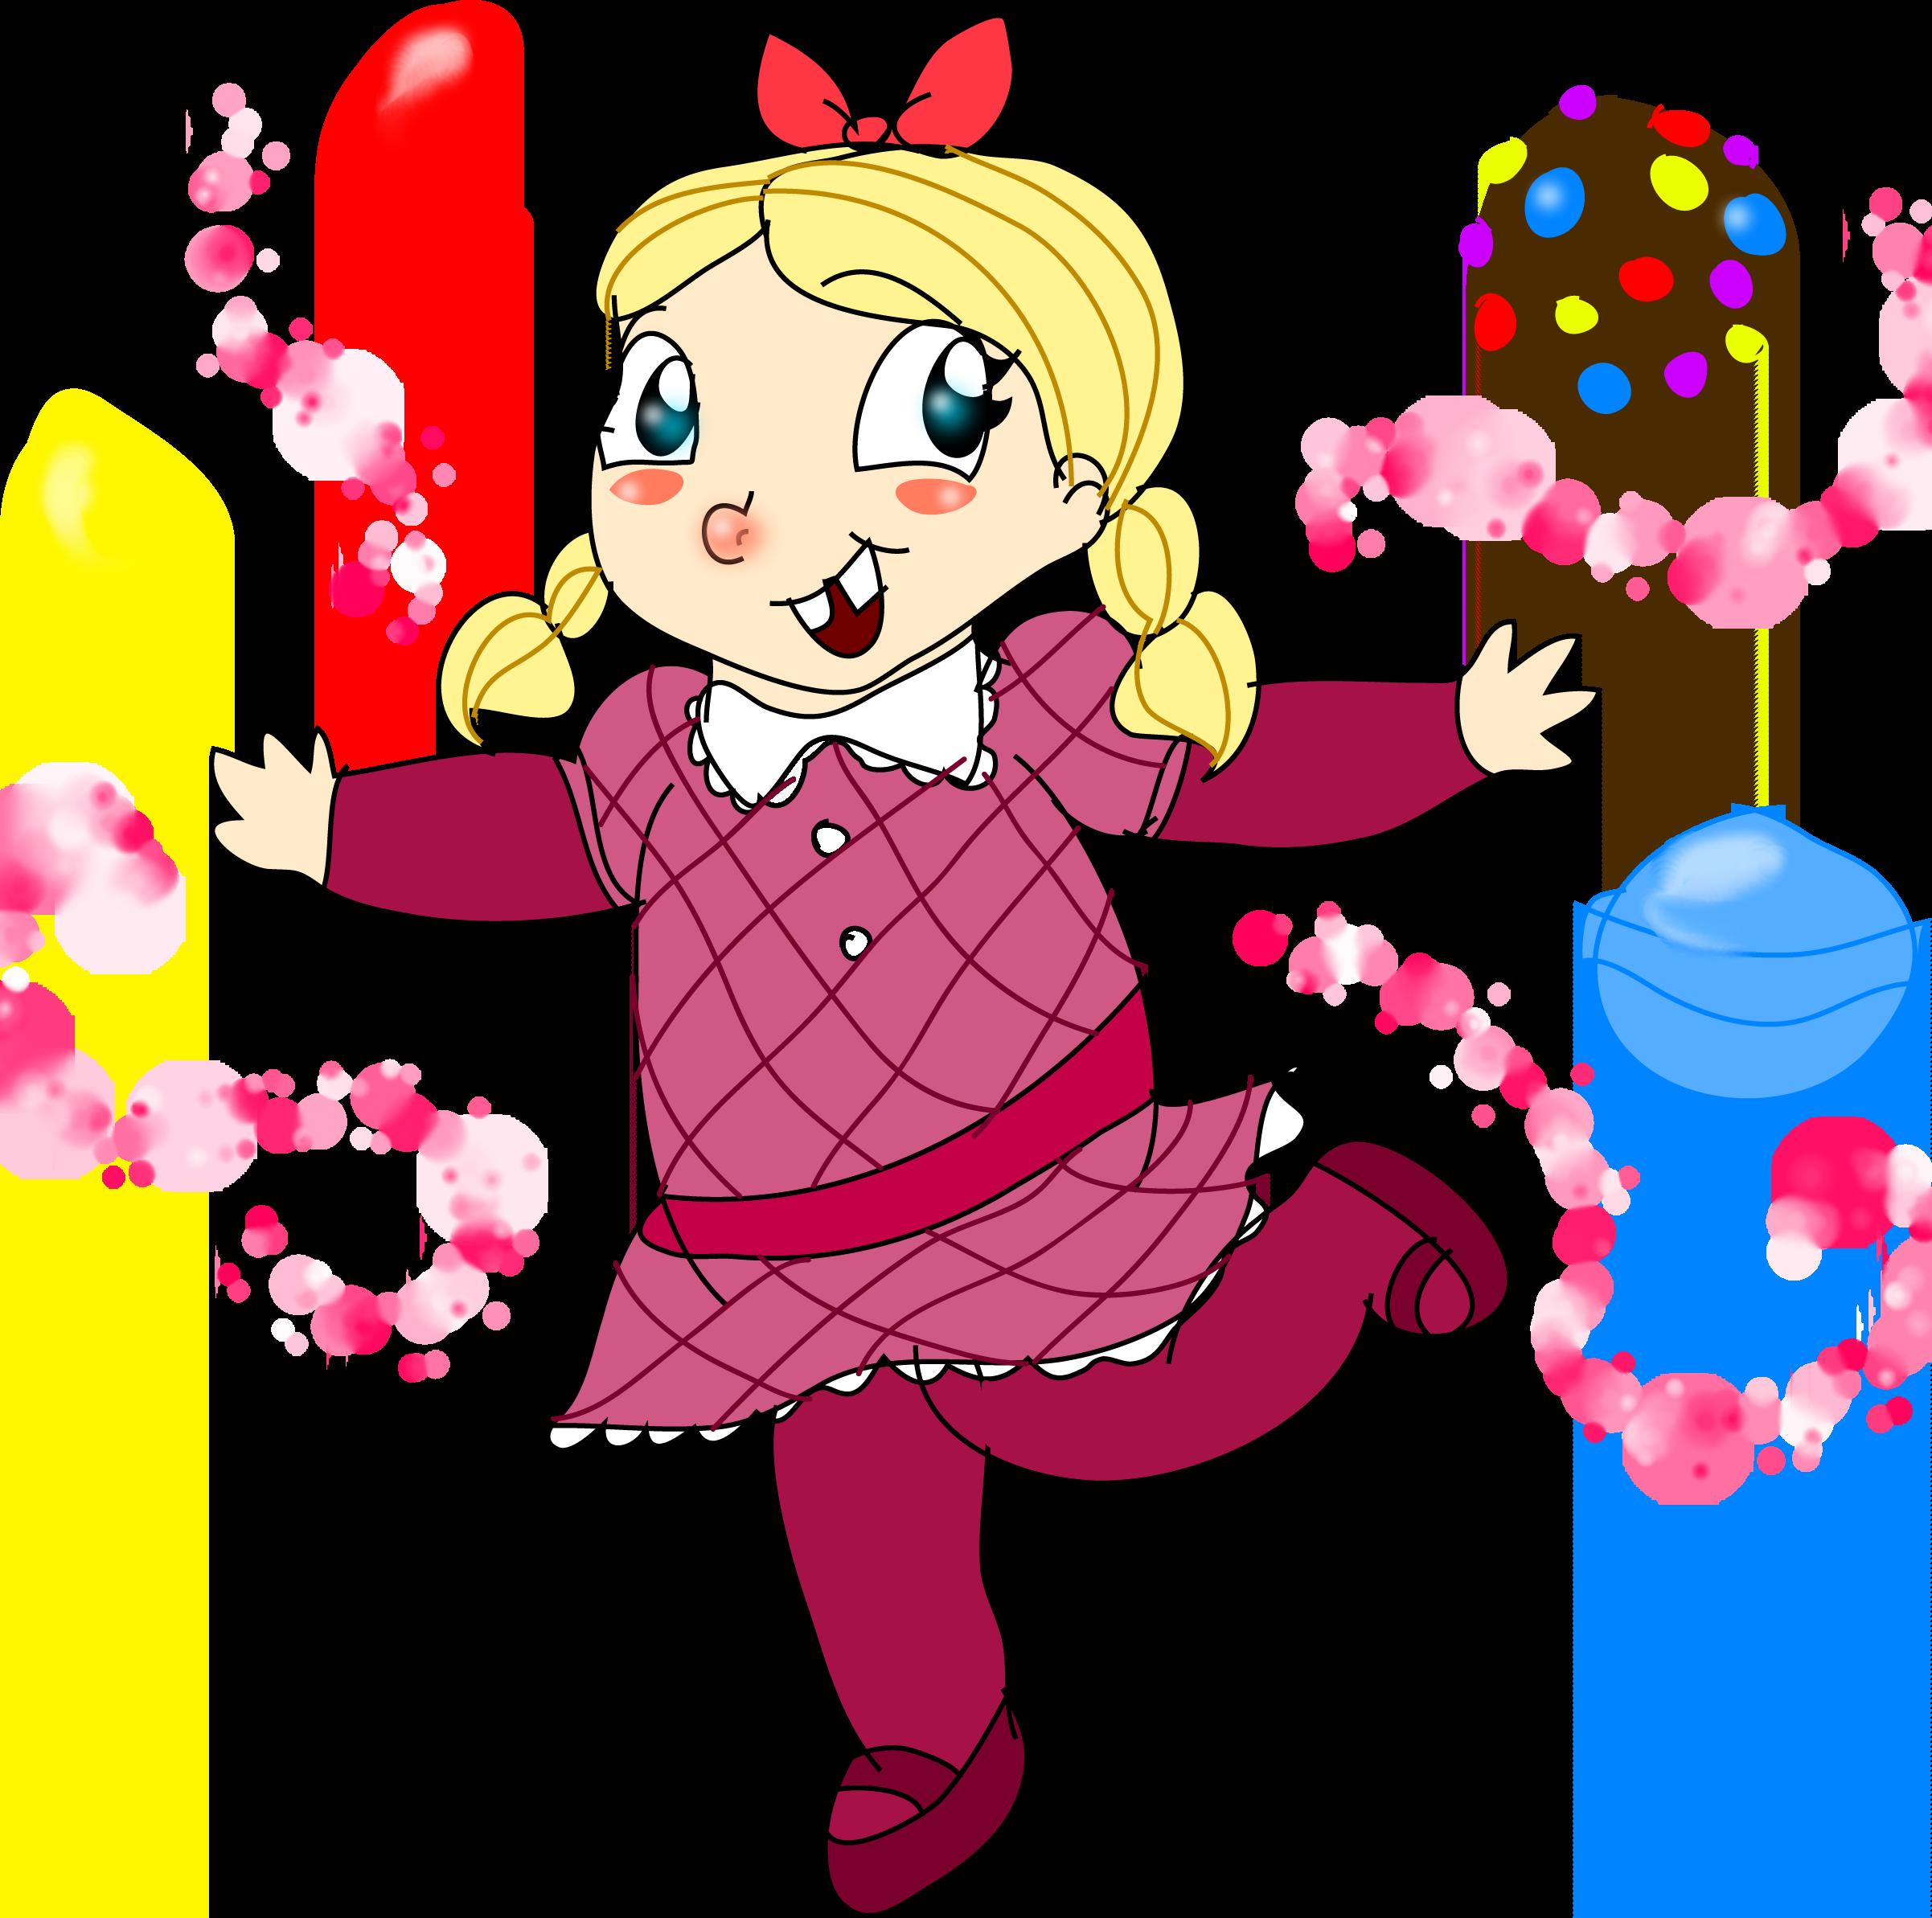 candy crush saga by purfectprincessgirl fan art digital art drawings